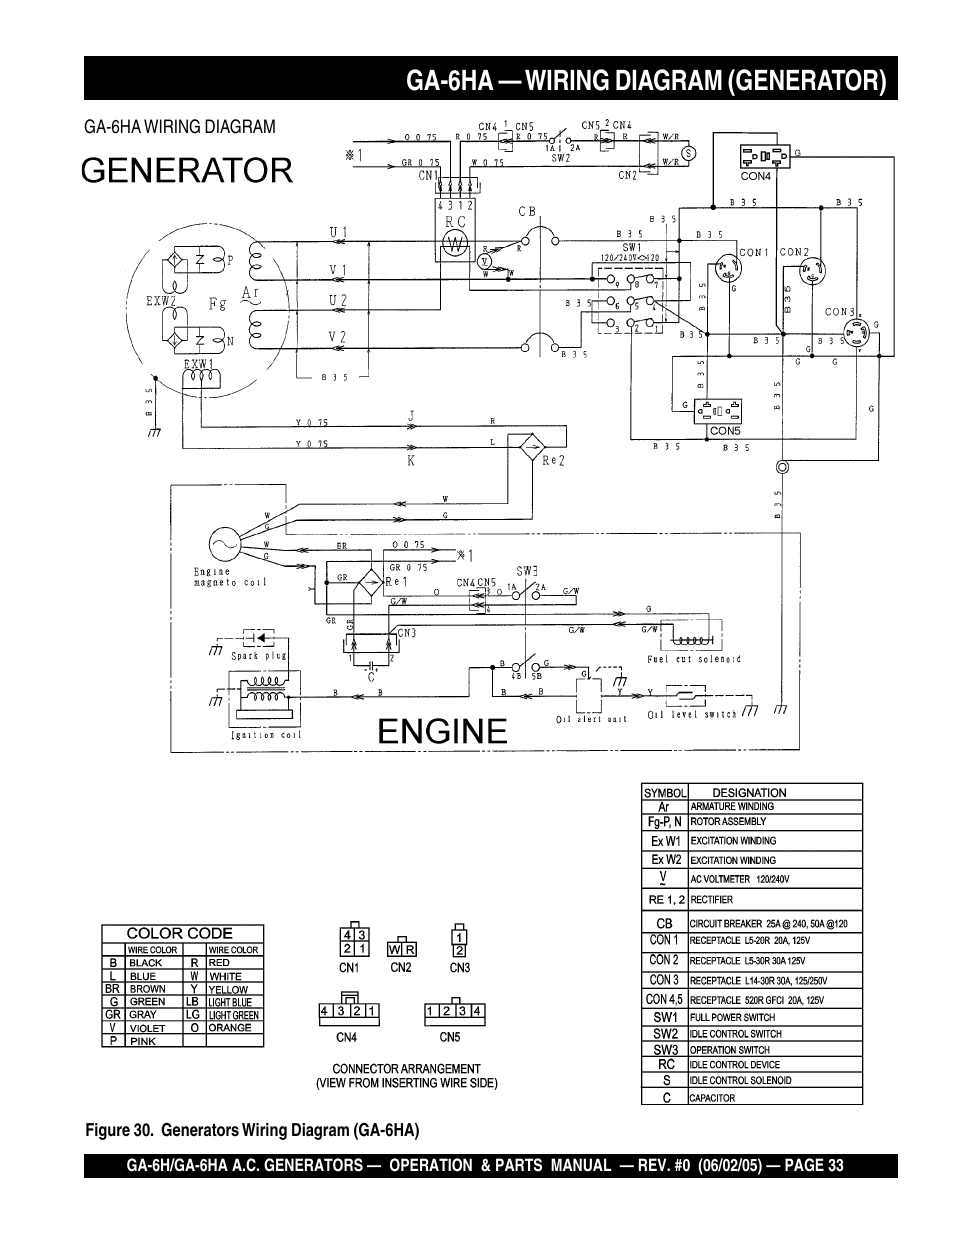 multiquip generator 4hk1x wiring schematic